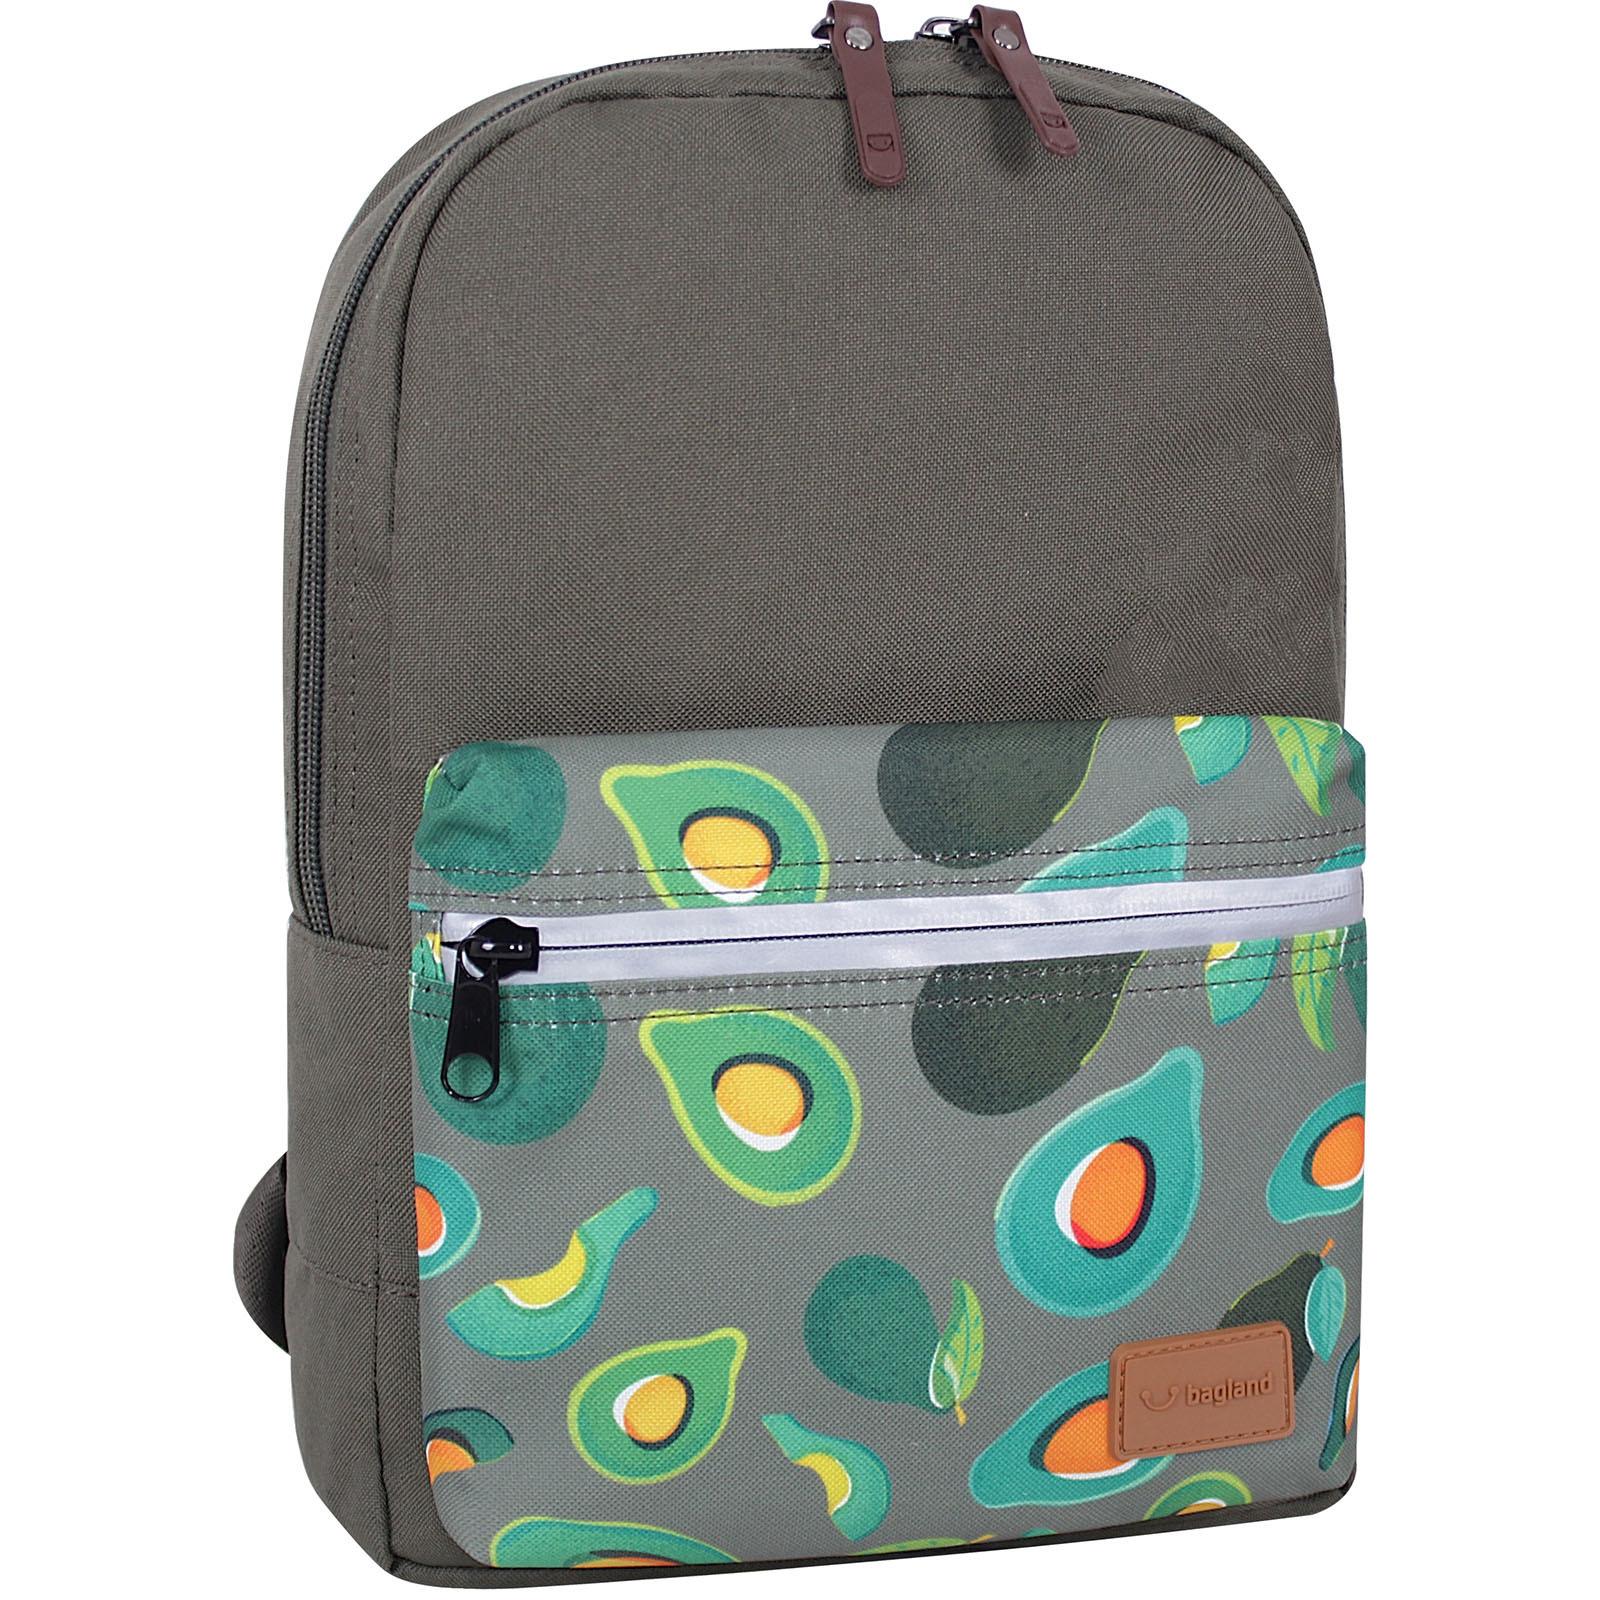 Молодежные рюкзаки Рюкзак Bagland Молодежный mini 8 л. хаки 754 (0050866) IMG_0872суб.754.JPG